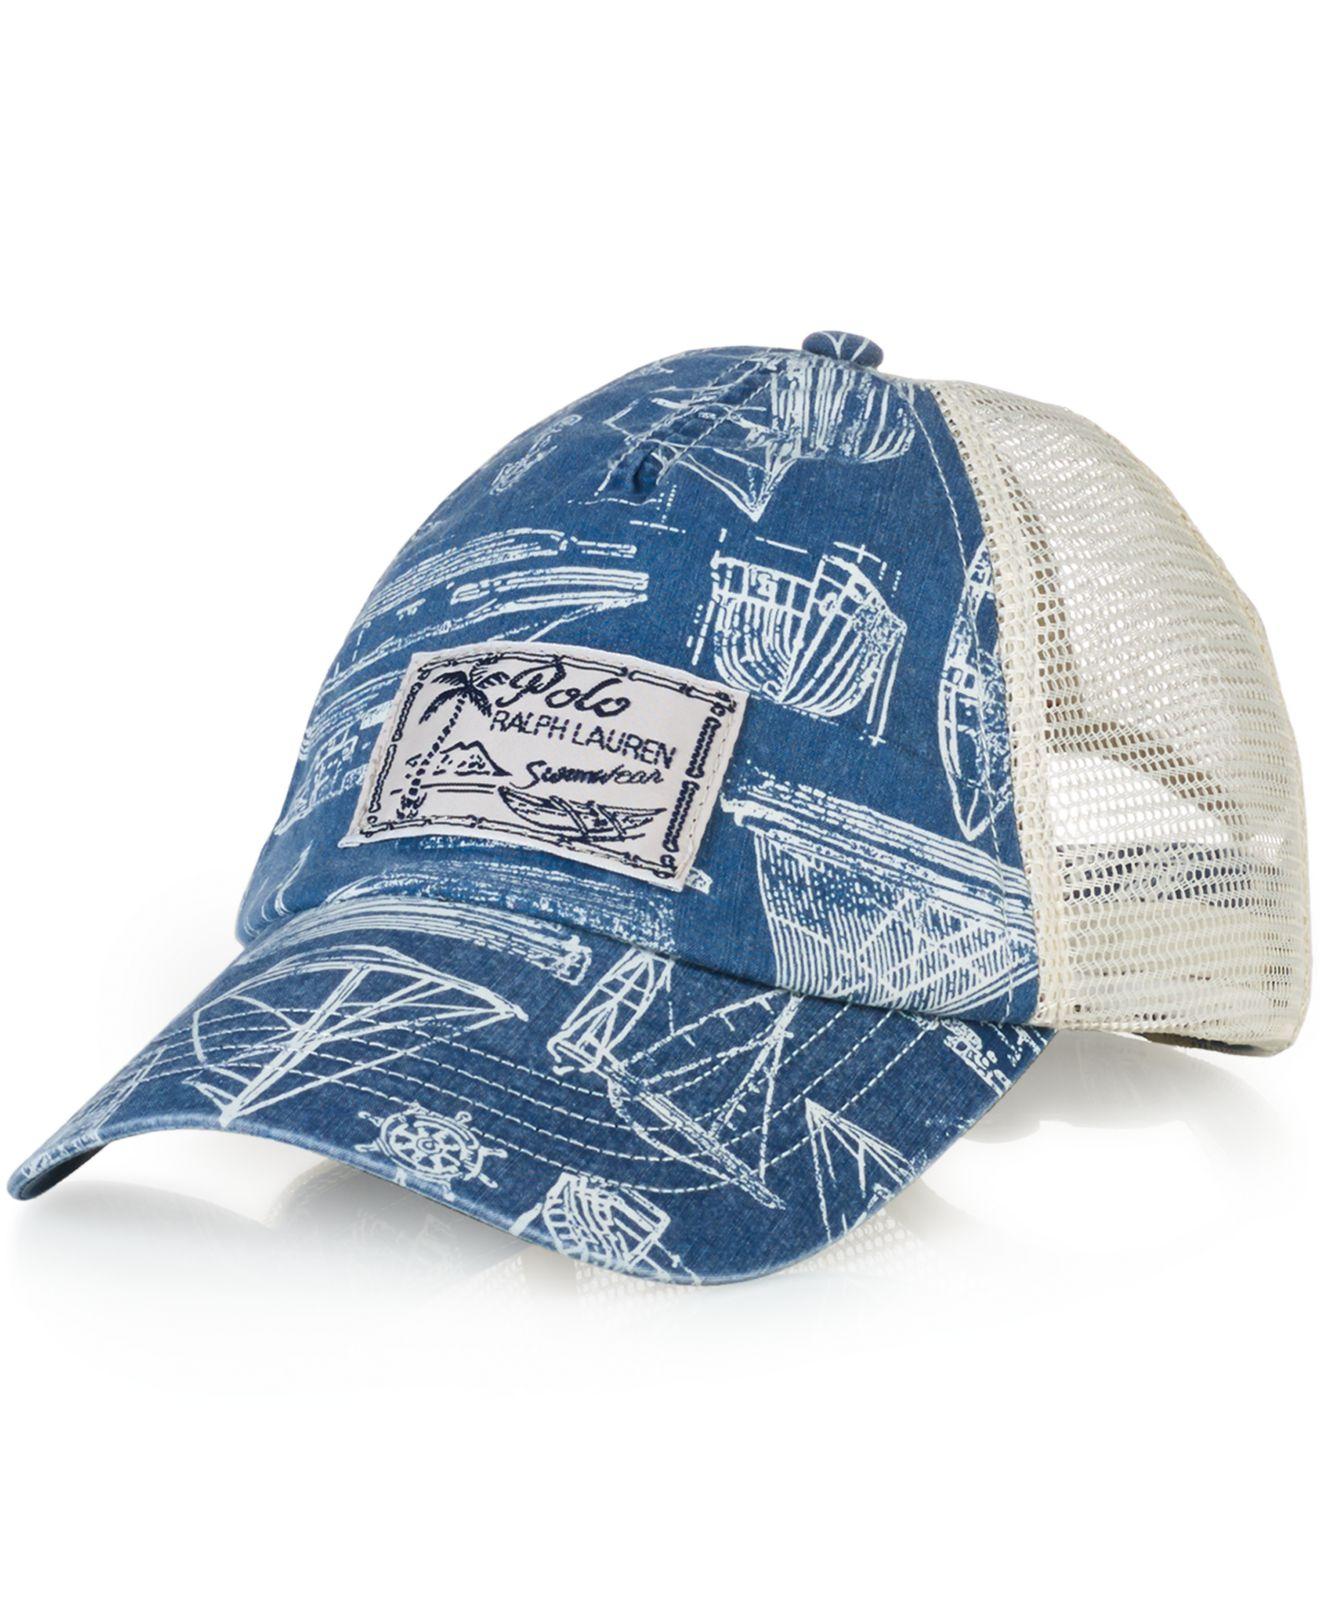 89cddf18b6ce7 Lyst - Polo Ralph Lauren Nautical Trucker Hat in Blue for Men